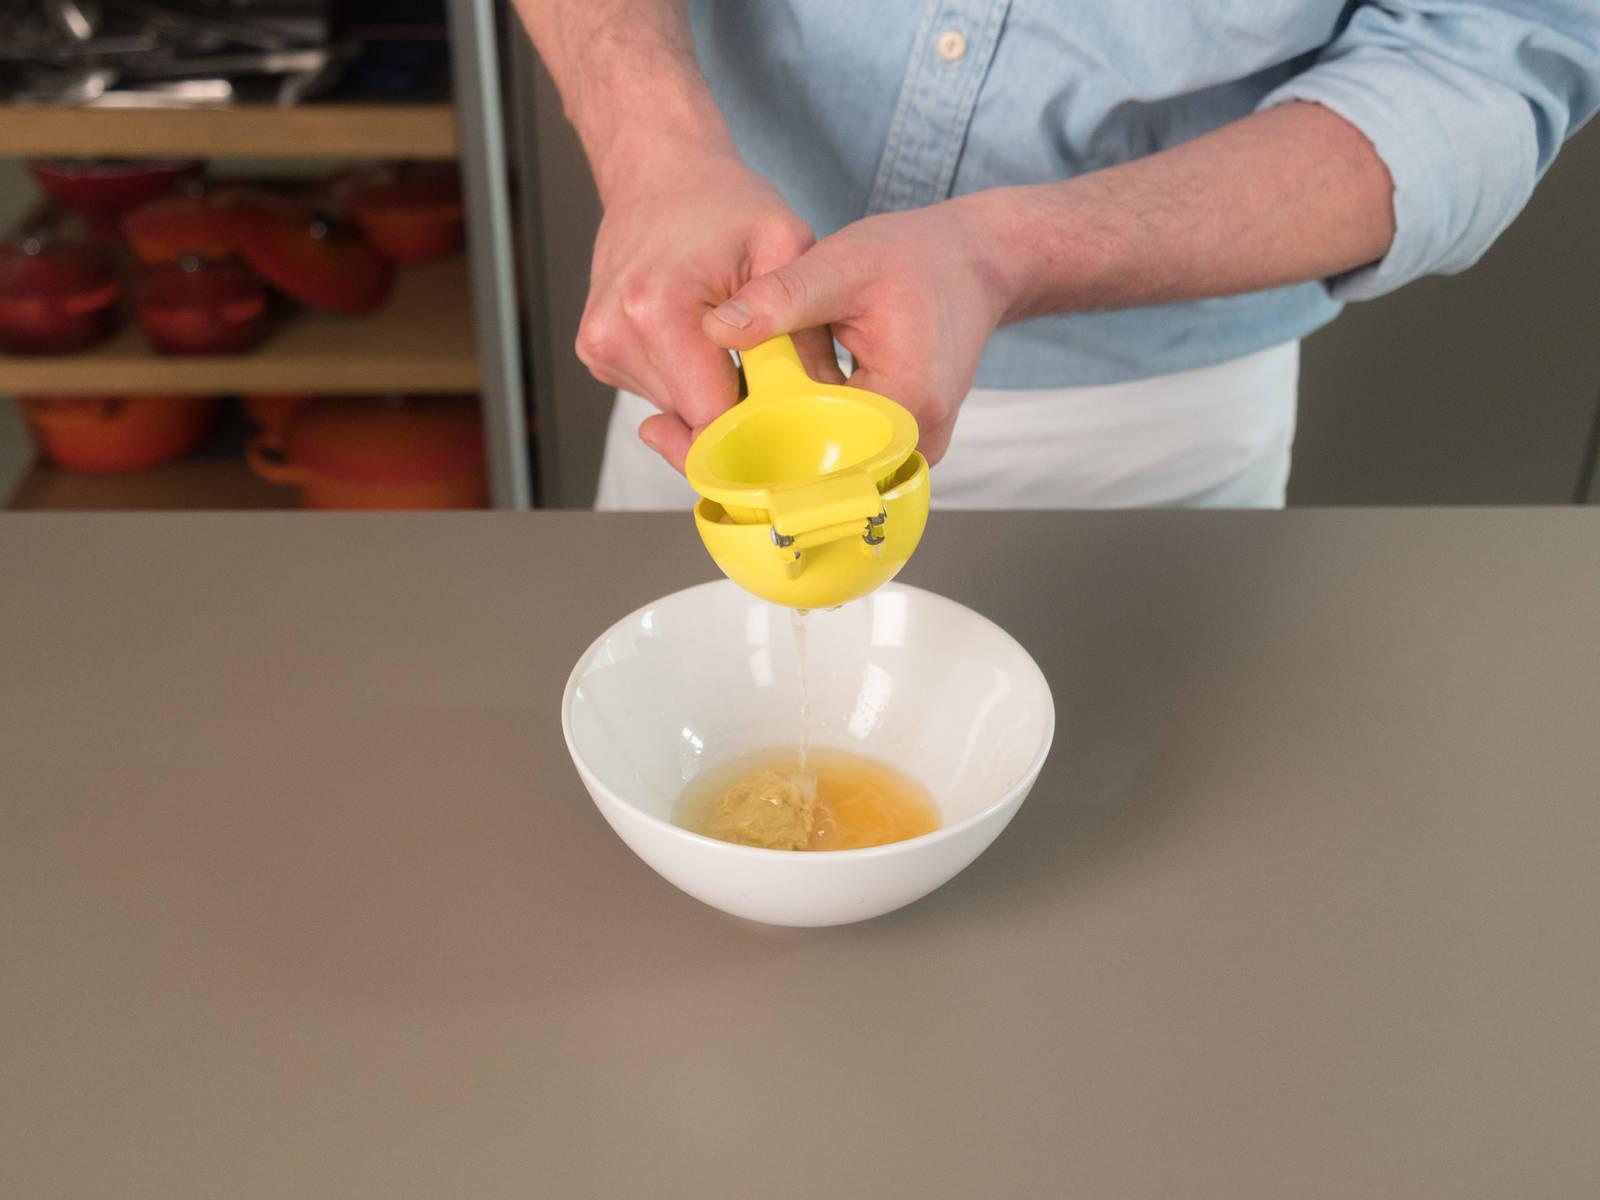 Prepare vinaigrette by stirring olive oil, mustard, lemon juice, and remaining orange juice together. Season with salt and pepper.